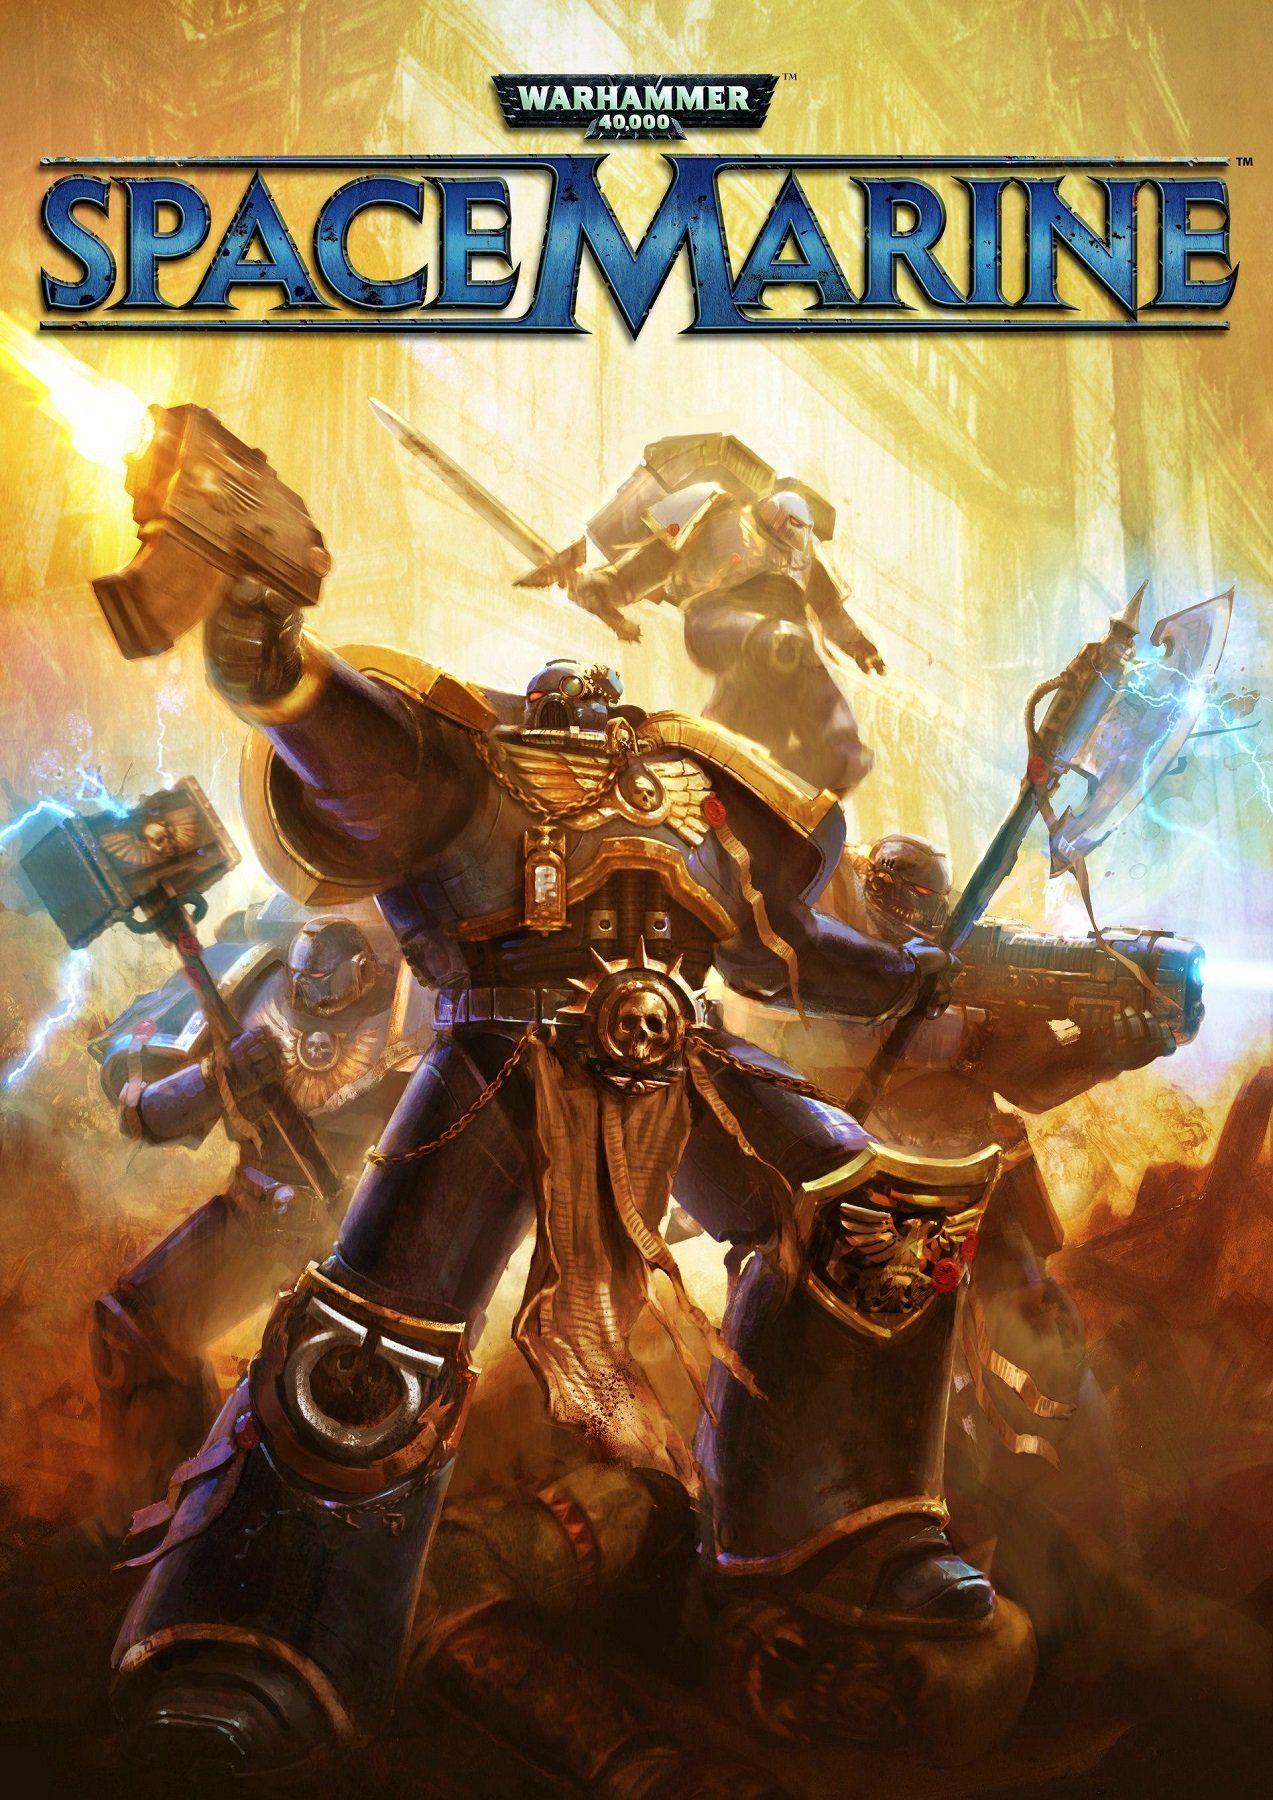 Warhammer 40,000: Space Marine Poster   War   Video game